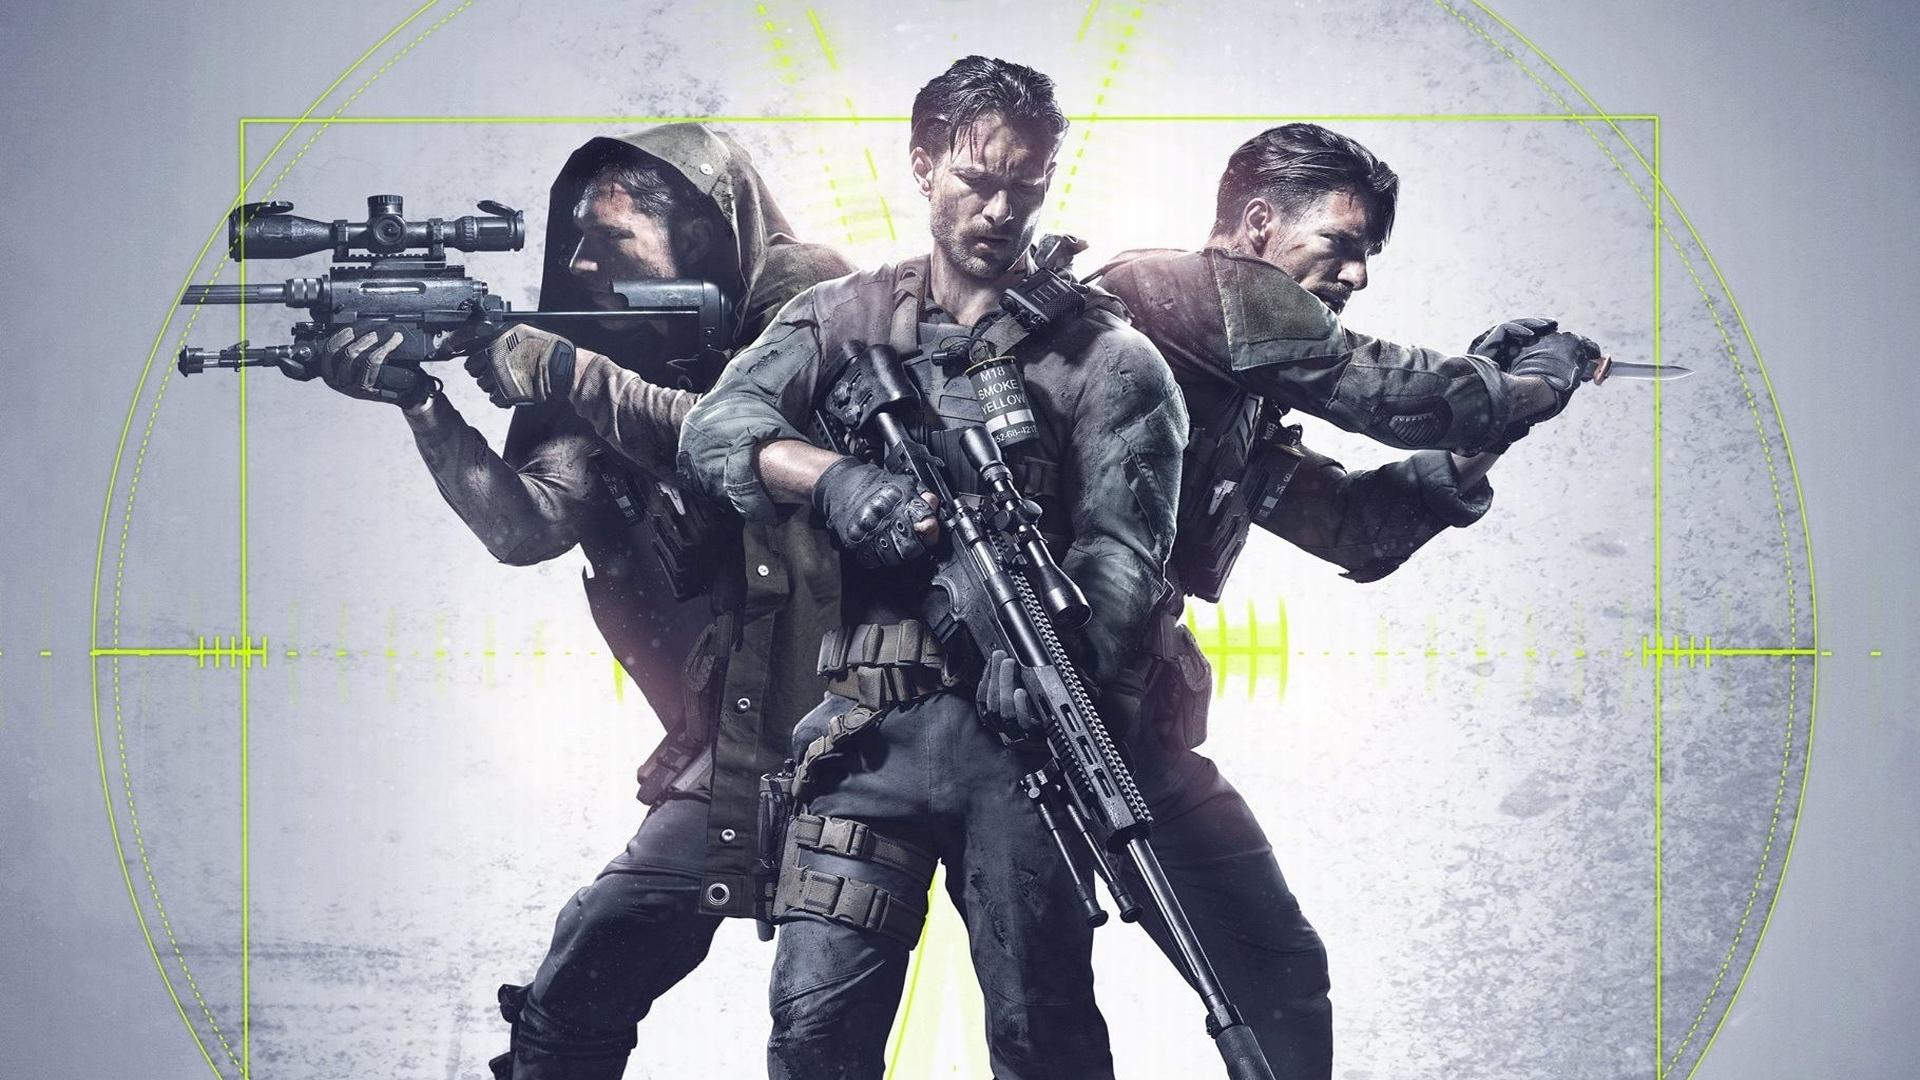 Sniper Ghost Warrior 3 Hd Wallpaper